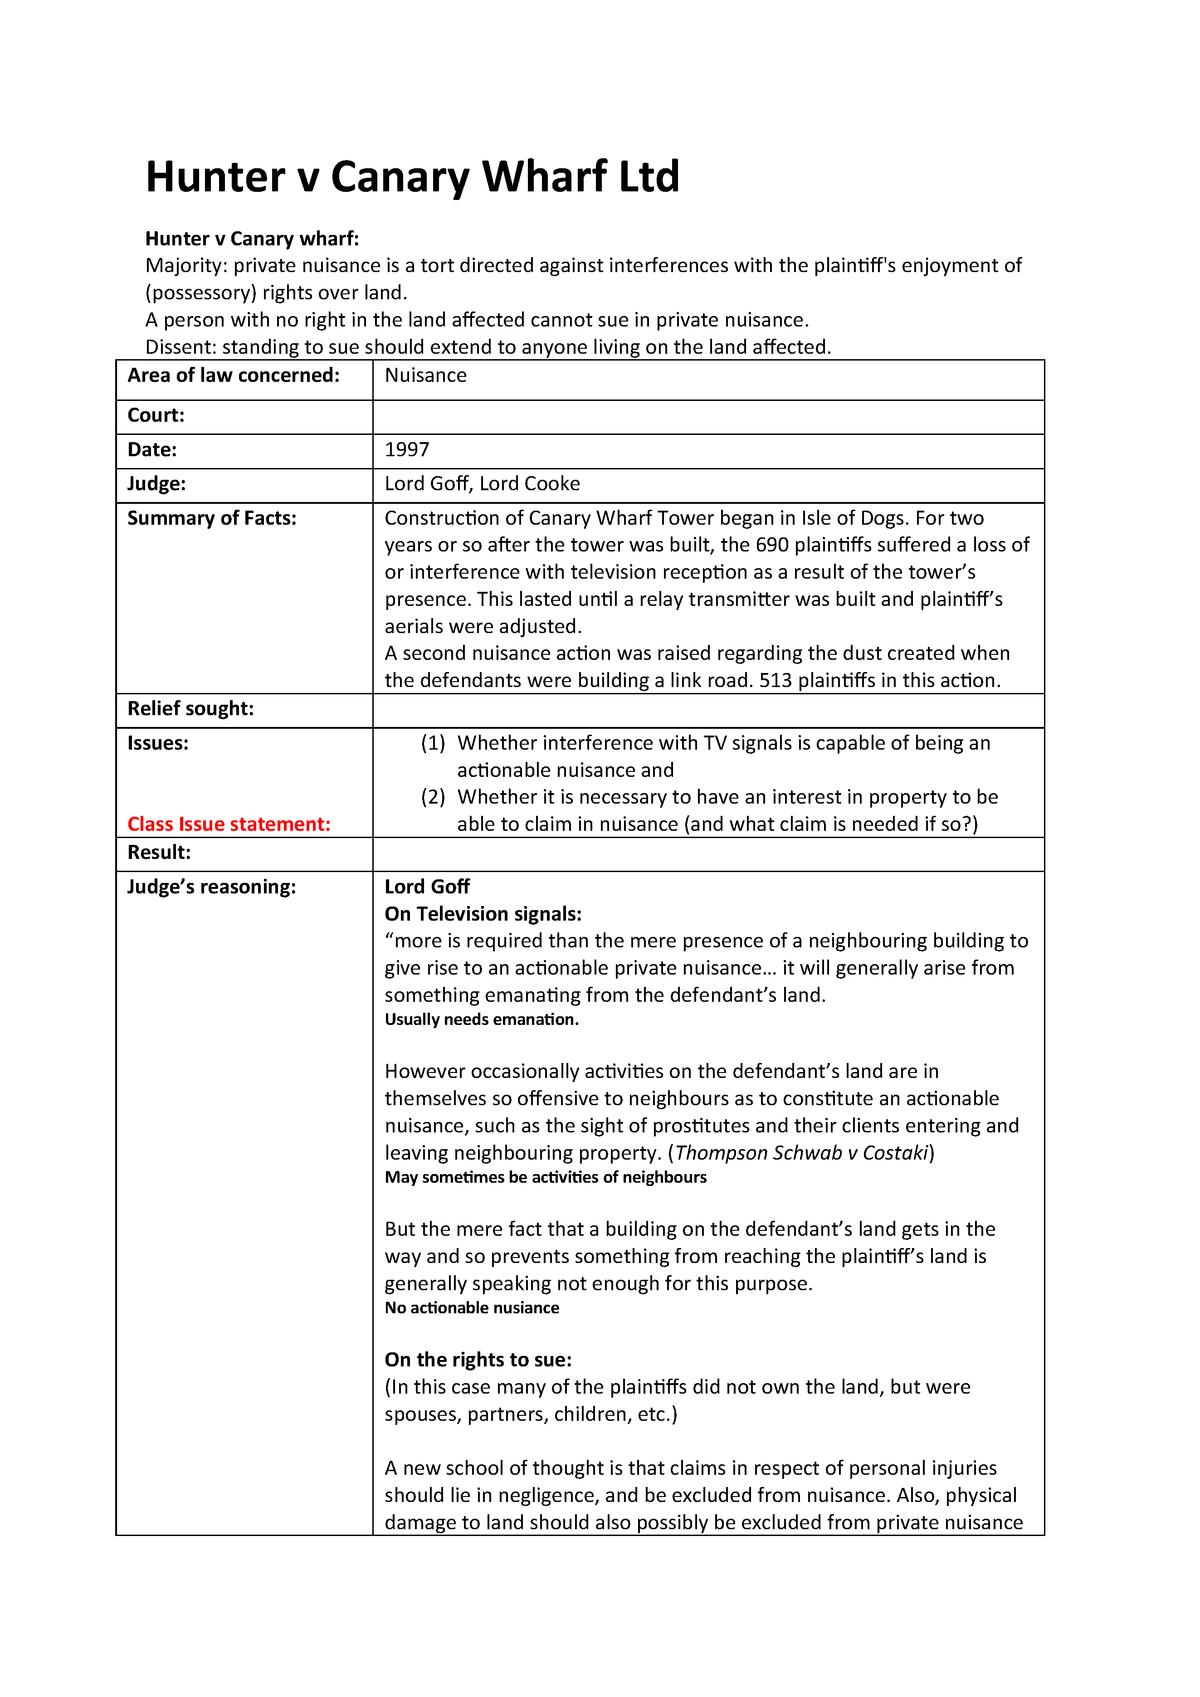 Hunter v Canary Wharf Ltd - The Law of Torts LAWS212 - StuDocu